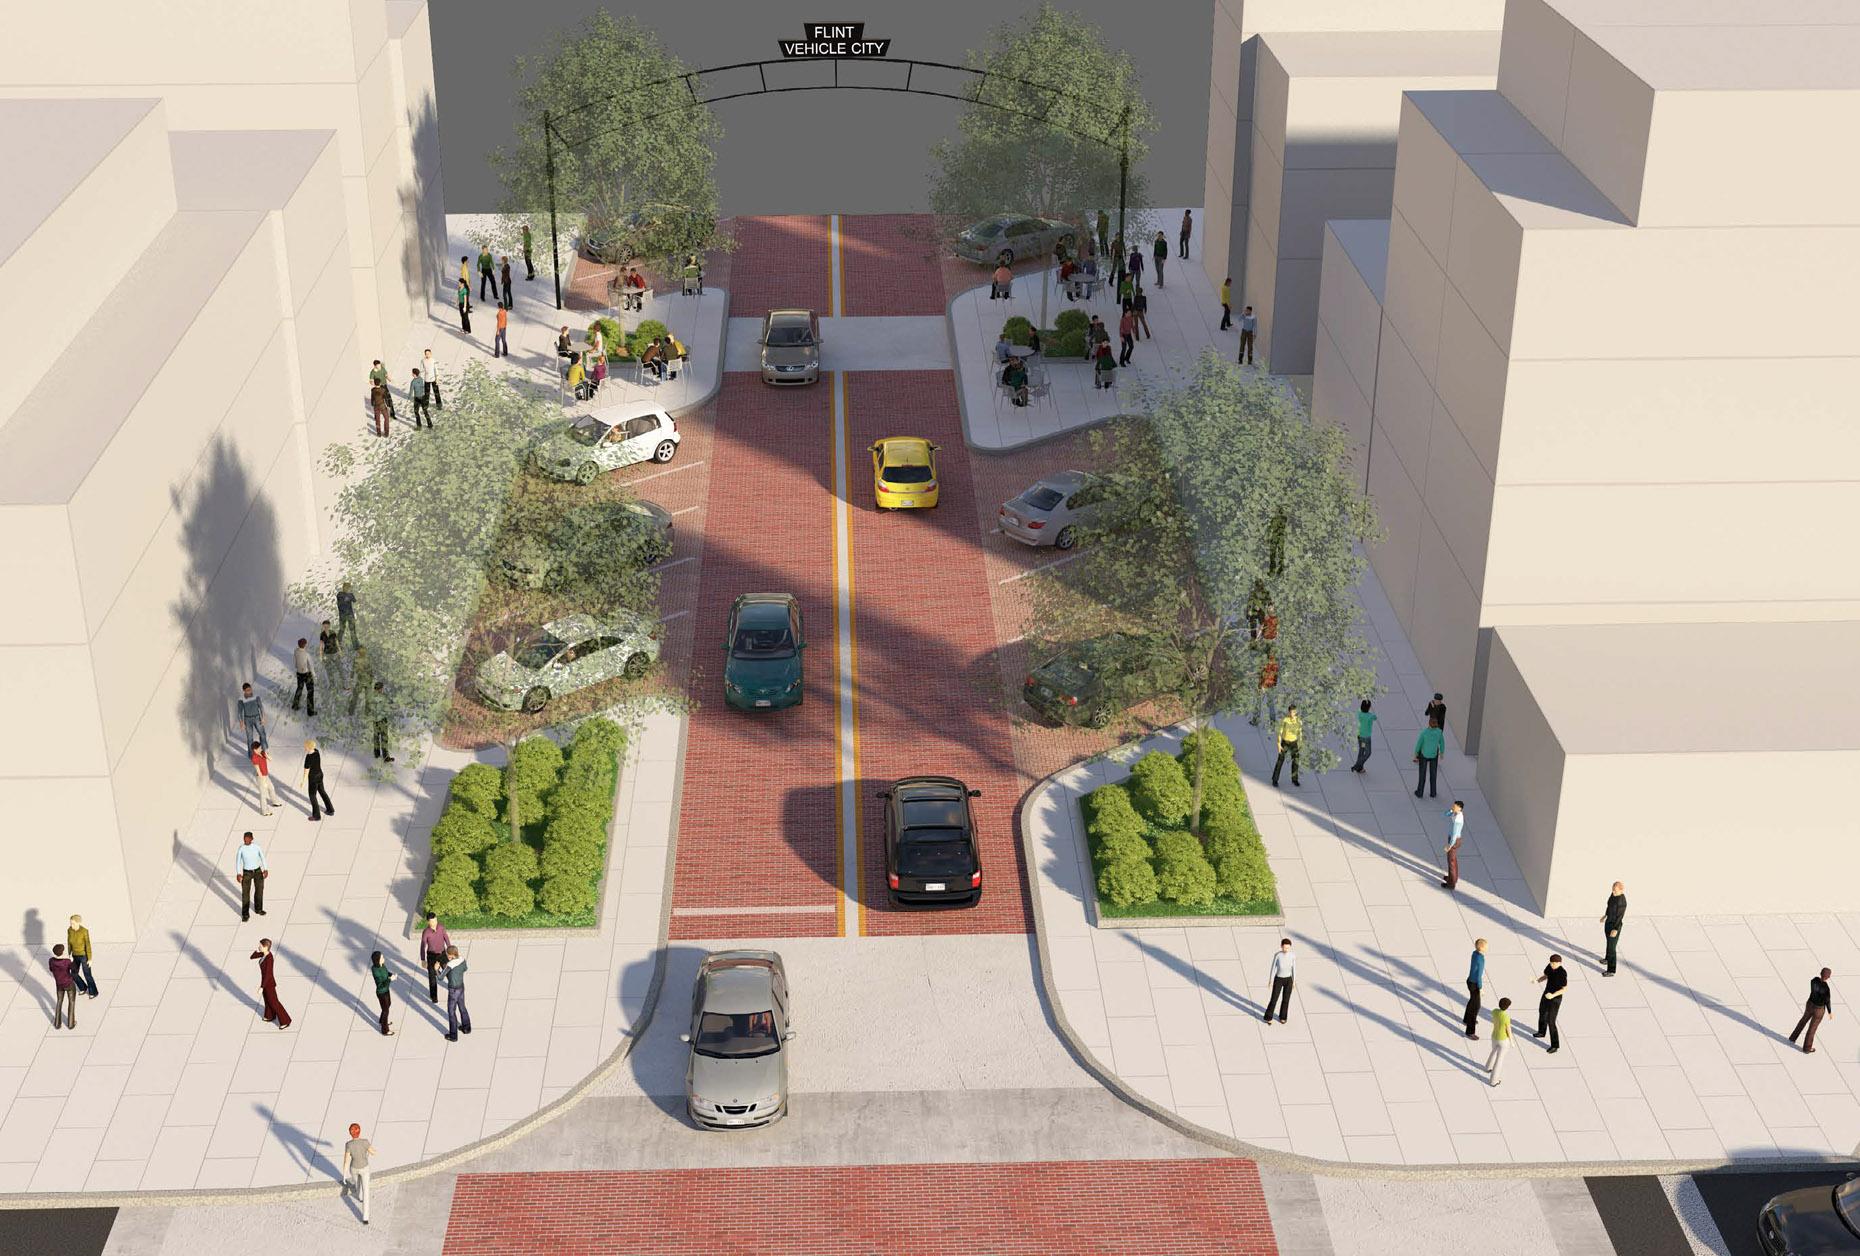 Downtown Flint Gameplan depicting preferred Saginaw Street enhancements